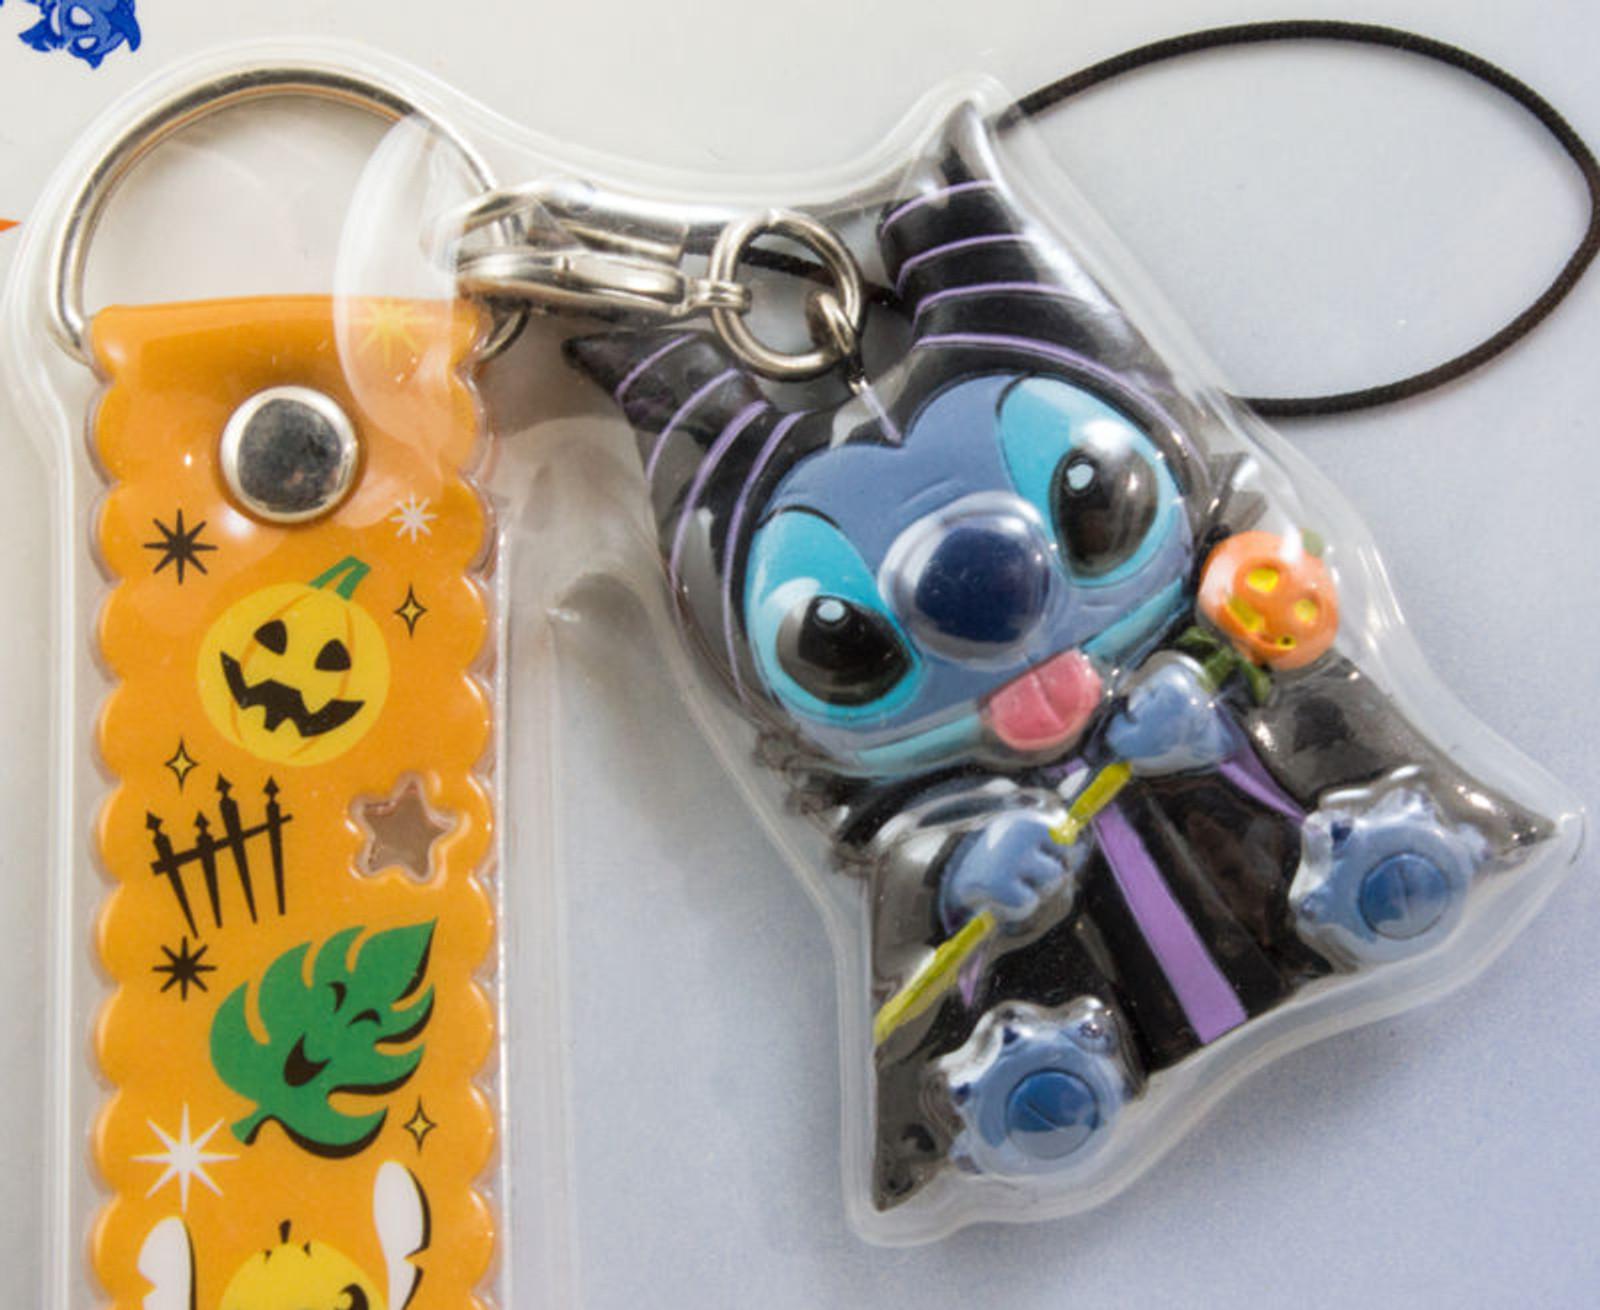 Disney Stitch Mobile Strap Halloween Ver. Mascot Figure Banpresto  JAPAN ANIME